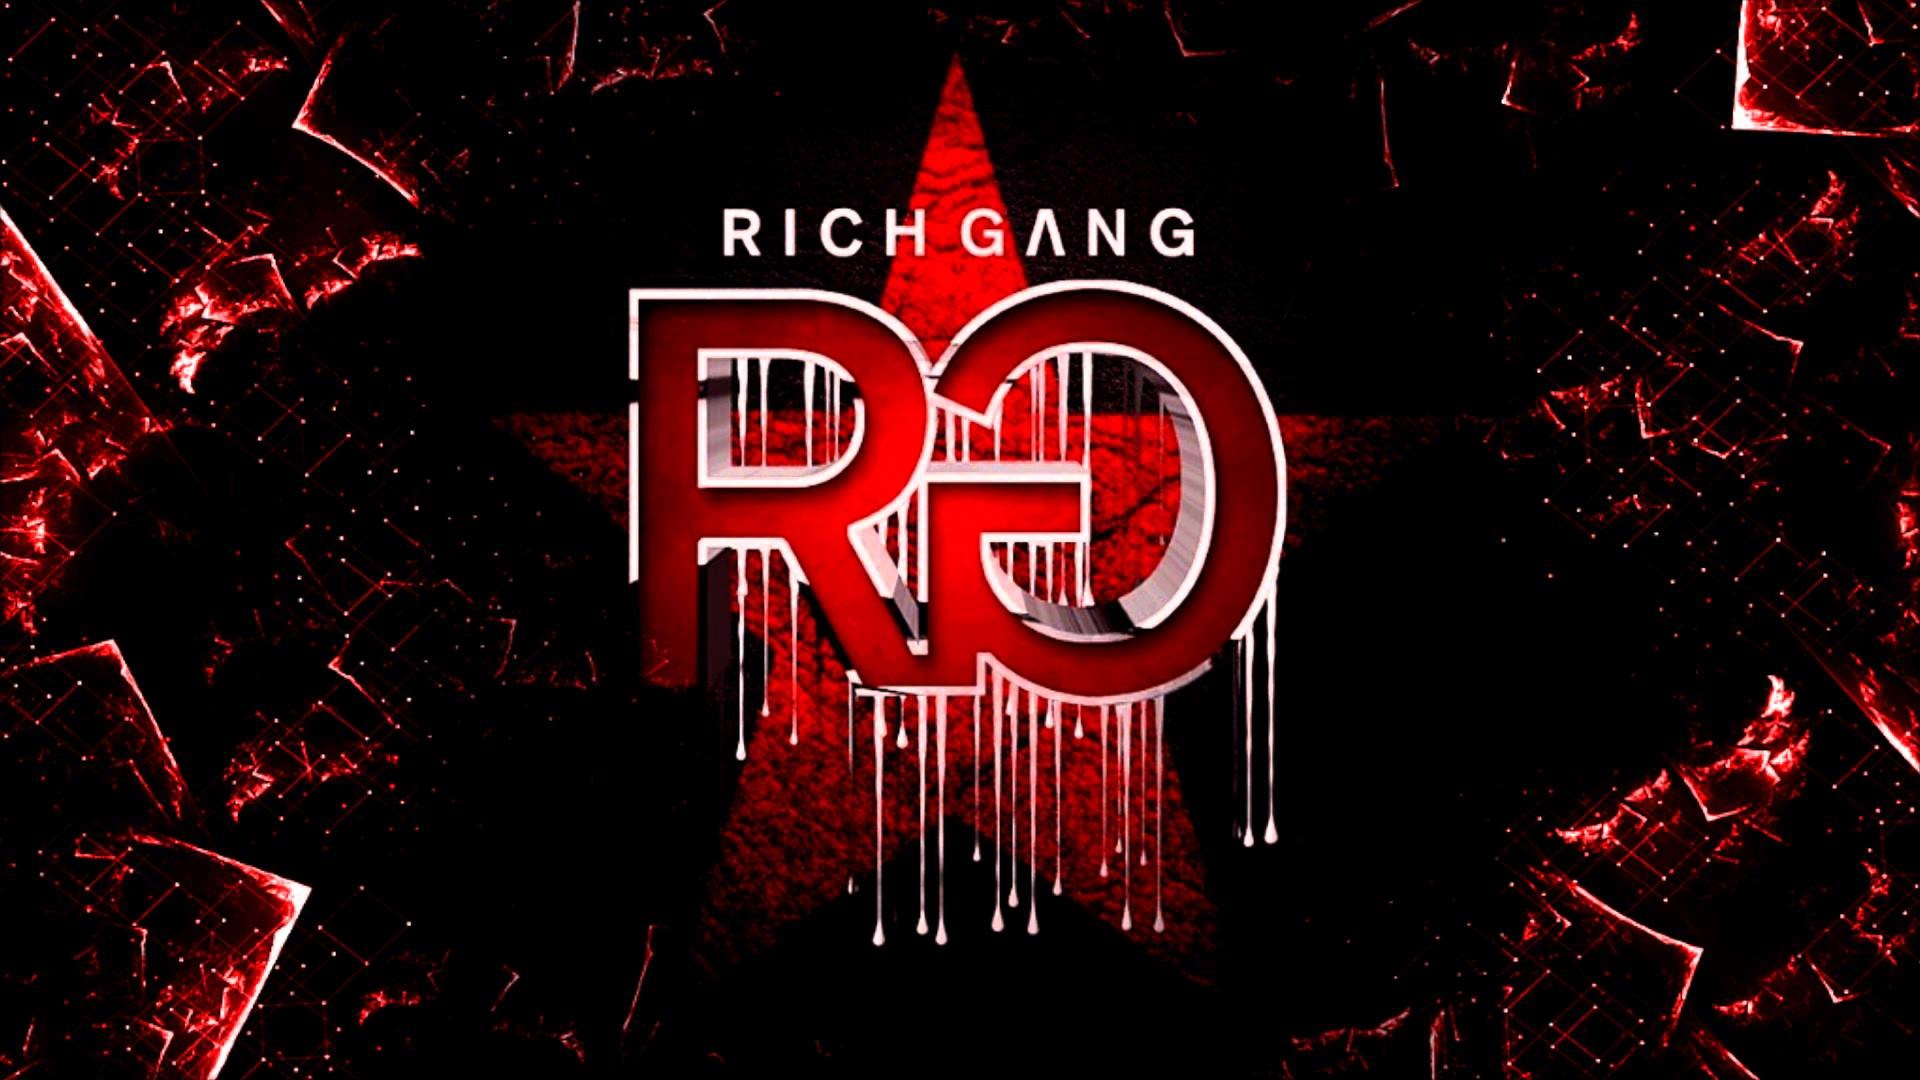 Rich Gang Logo Wallpaper Rich gang album cover